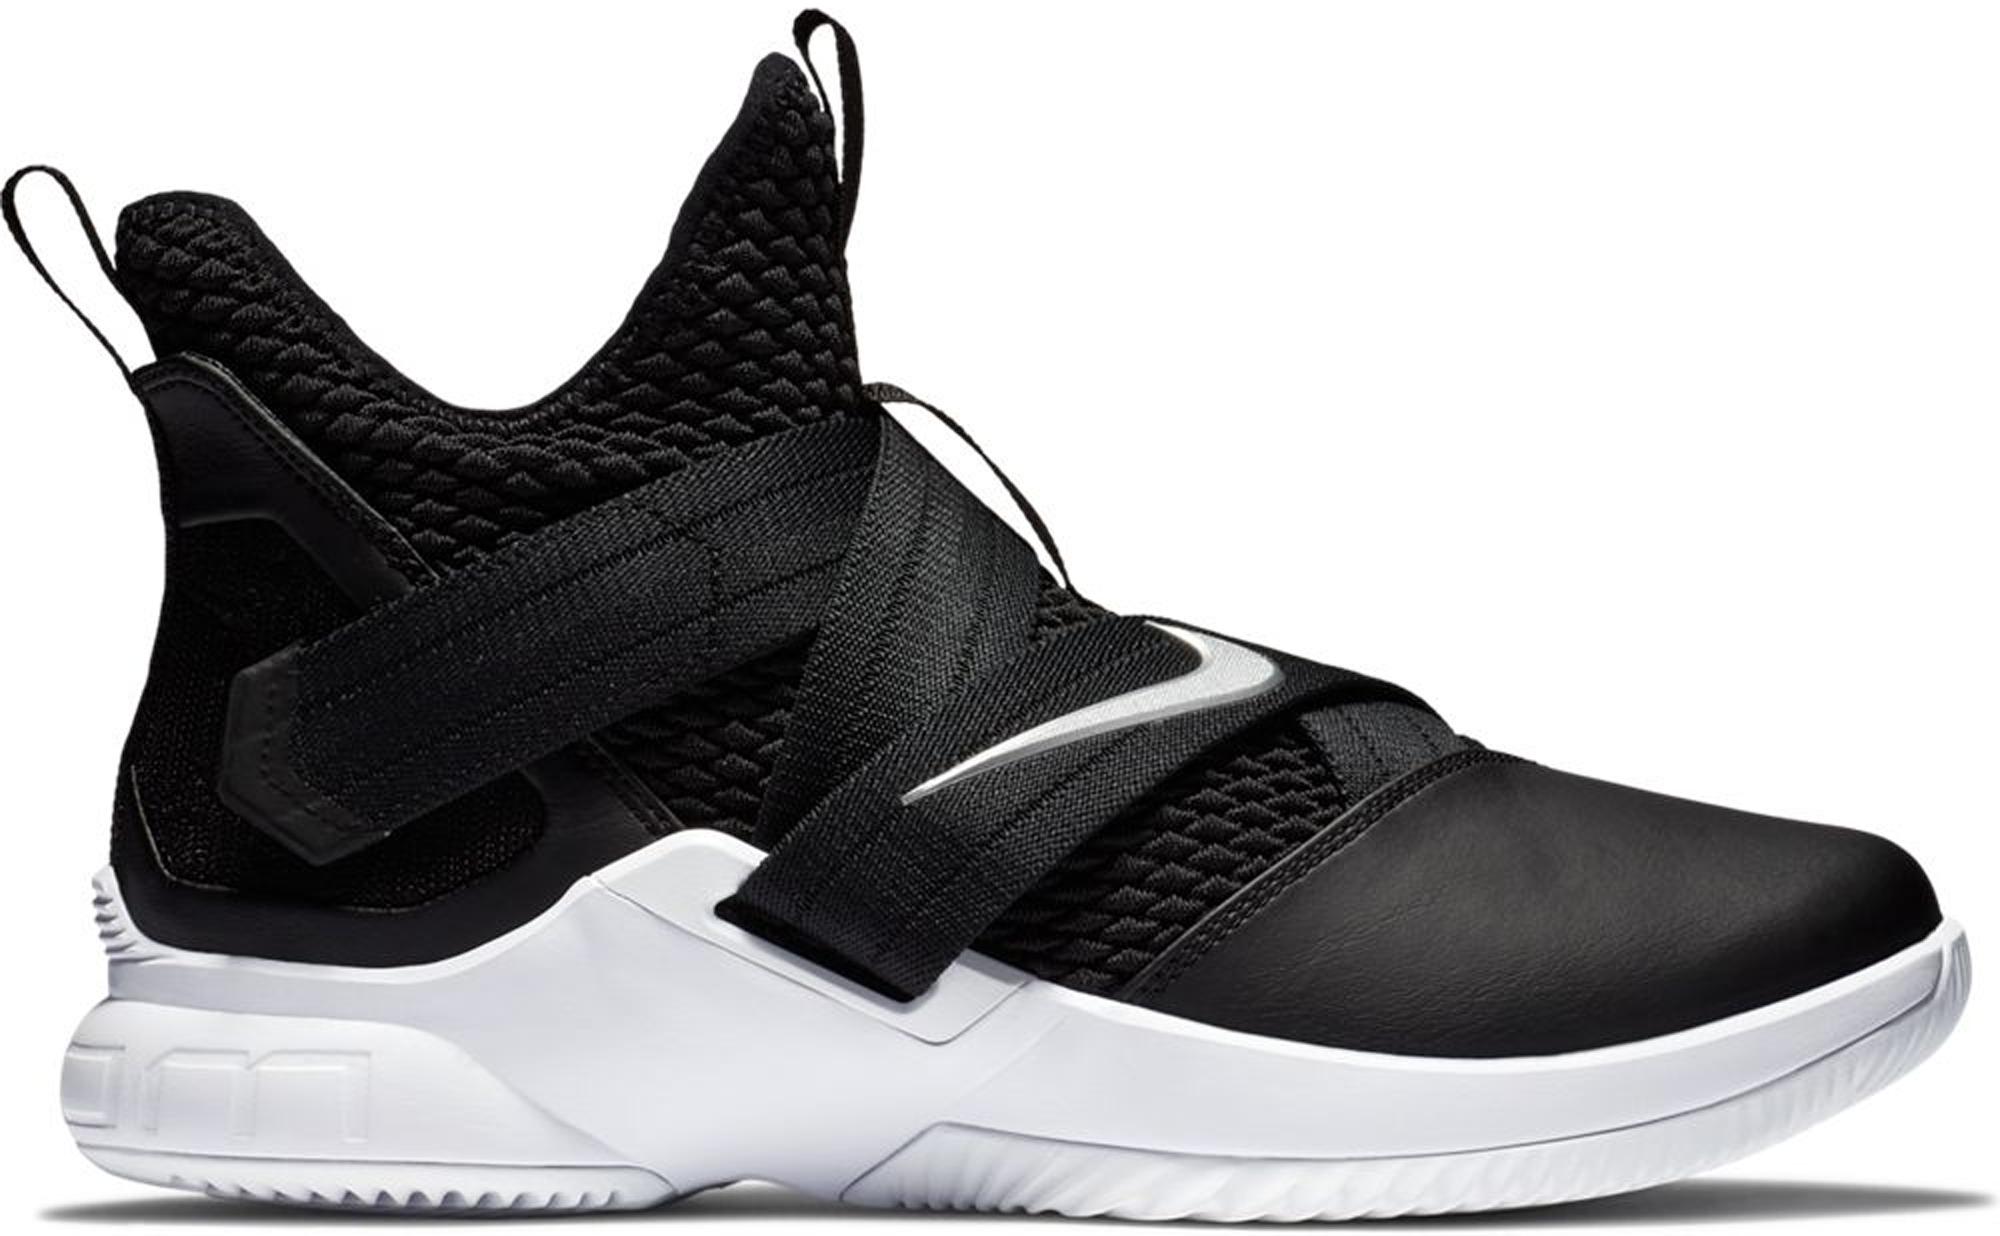 Nike LeBron Soldier 12 TB Black White